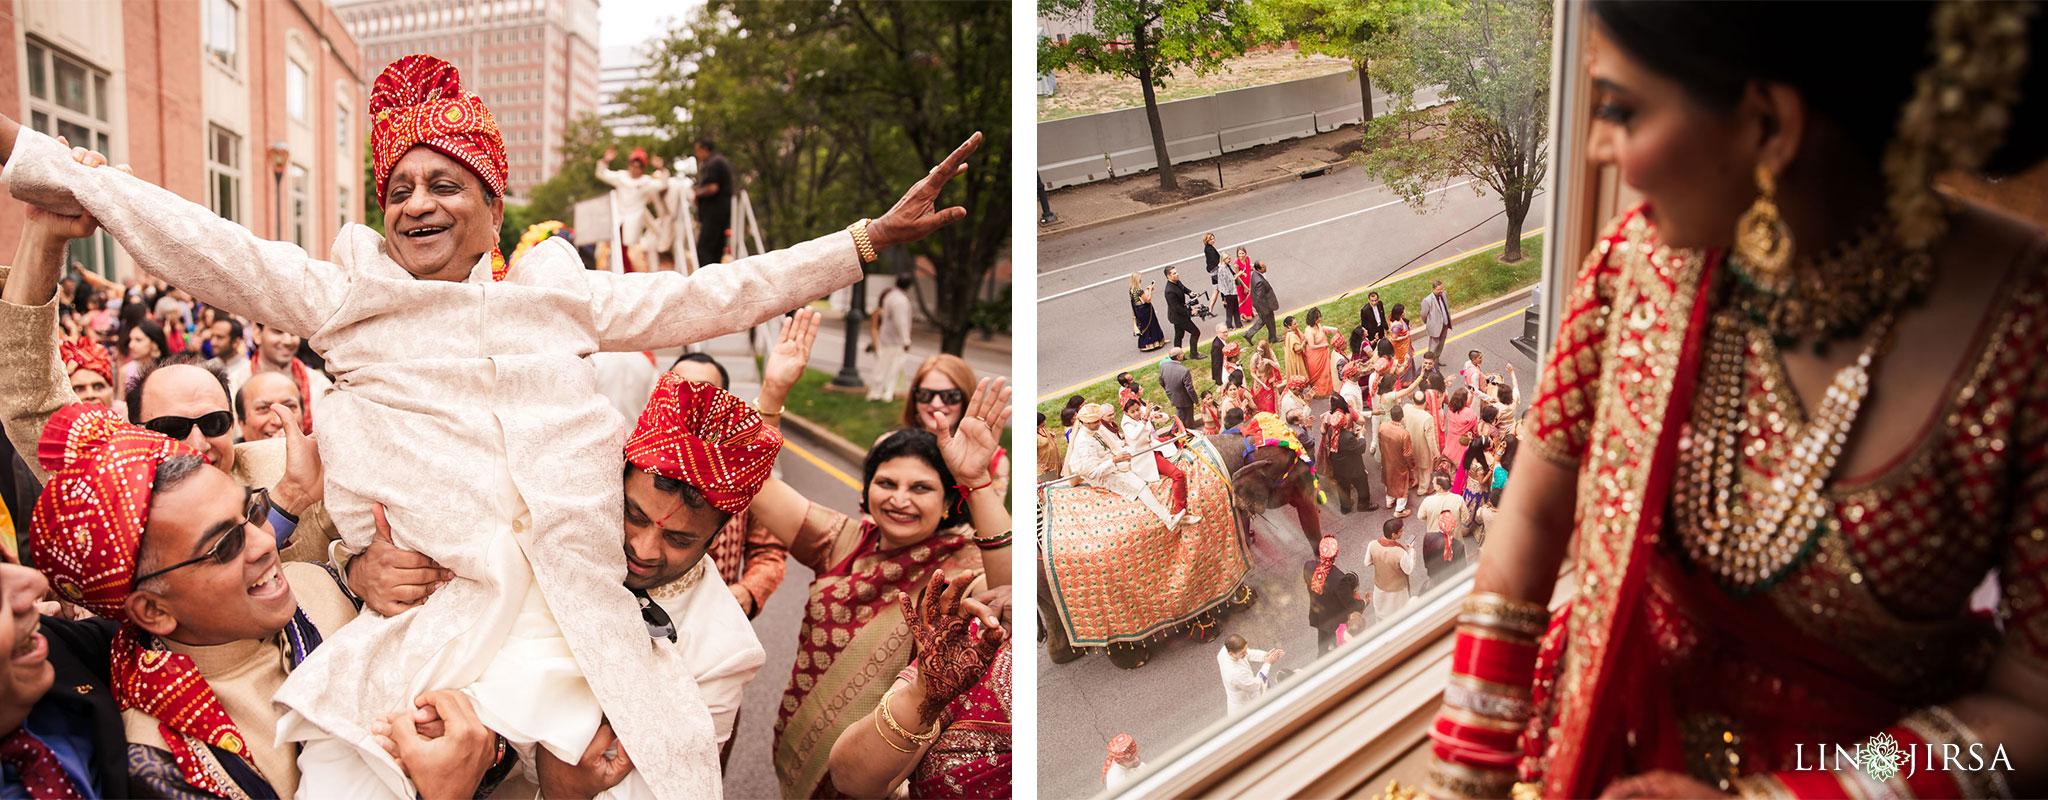 26 Ritz Carlton St Louis Missouri Indian Wedding Photography